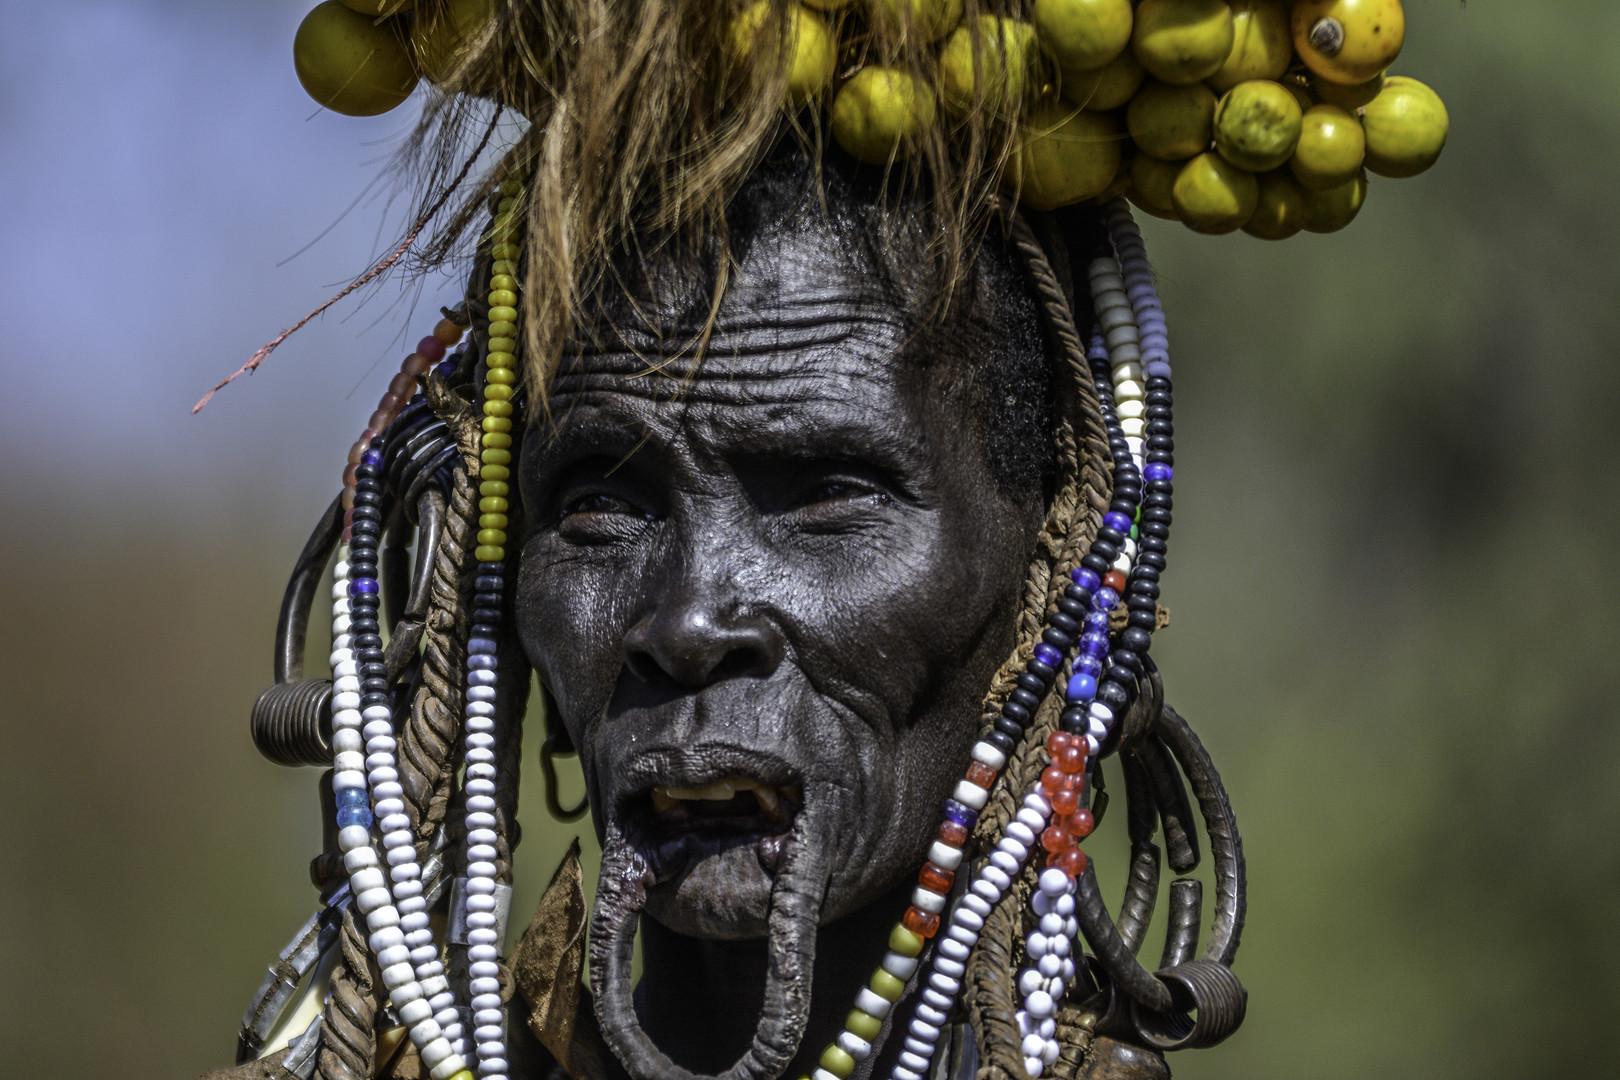 žena plemena Mursi